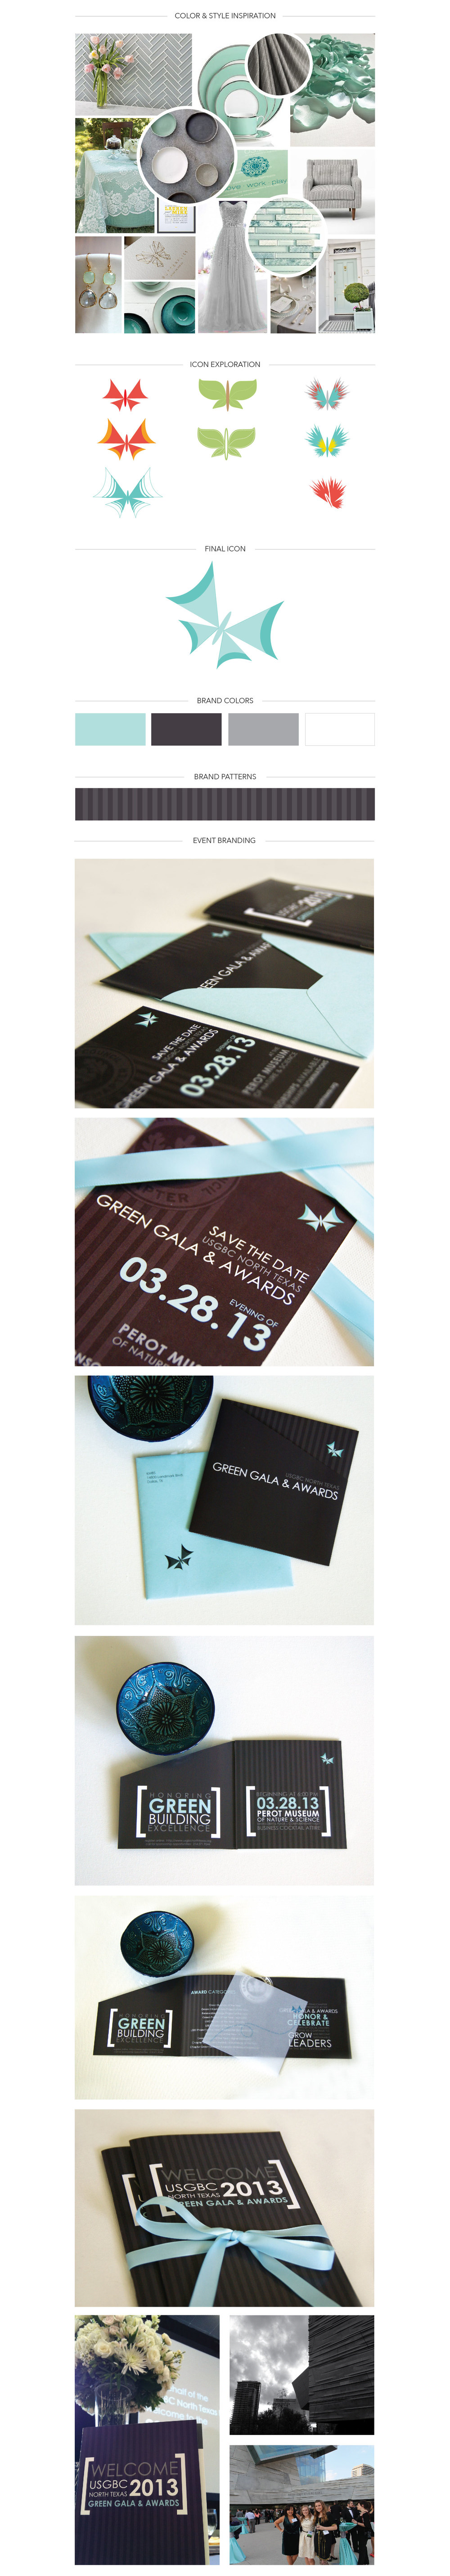 Green Gala Process-01.jpg